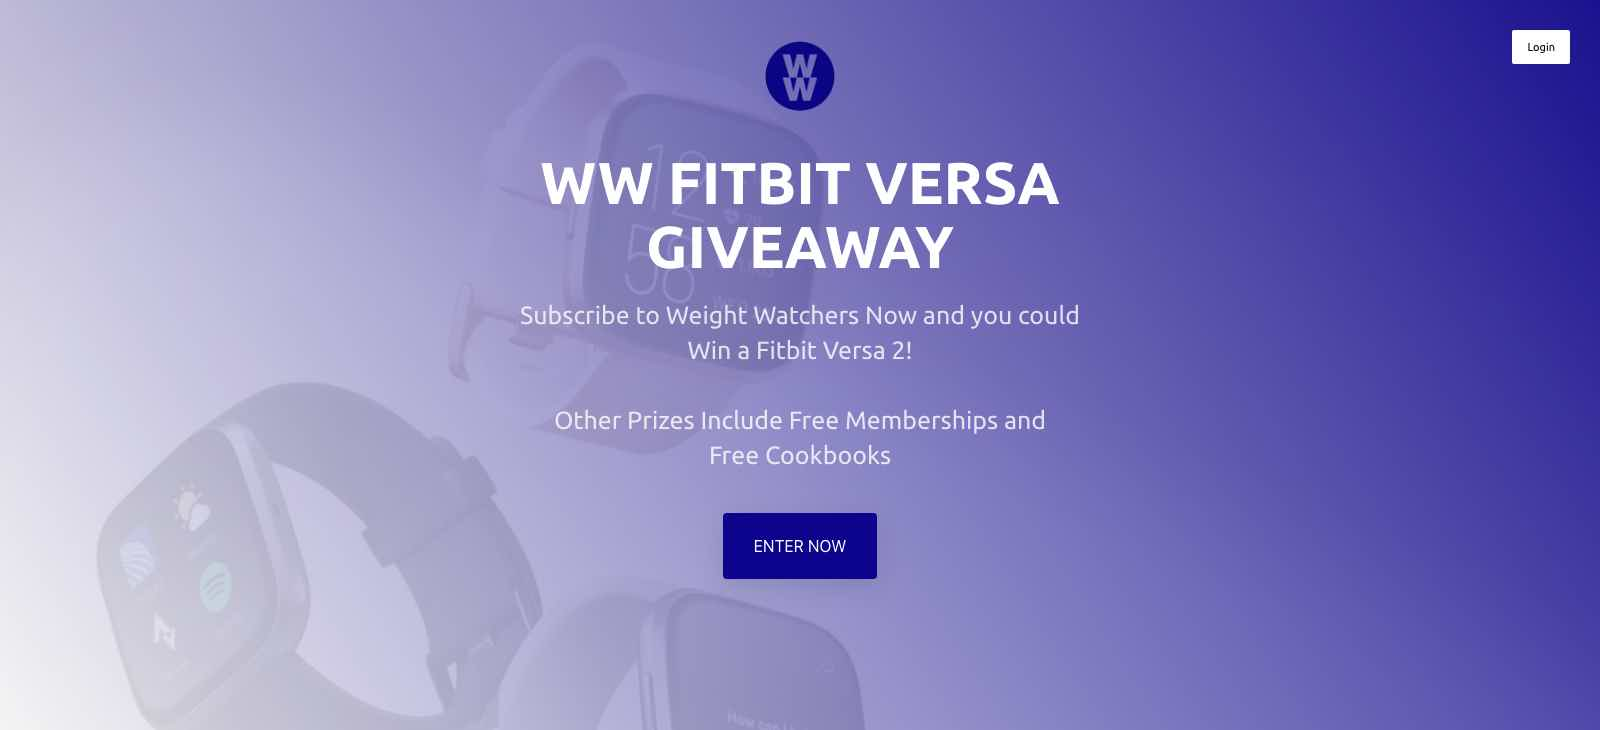 Weight Watchers Fitbit Versa Giveaway